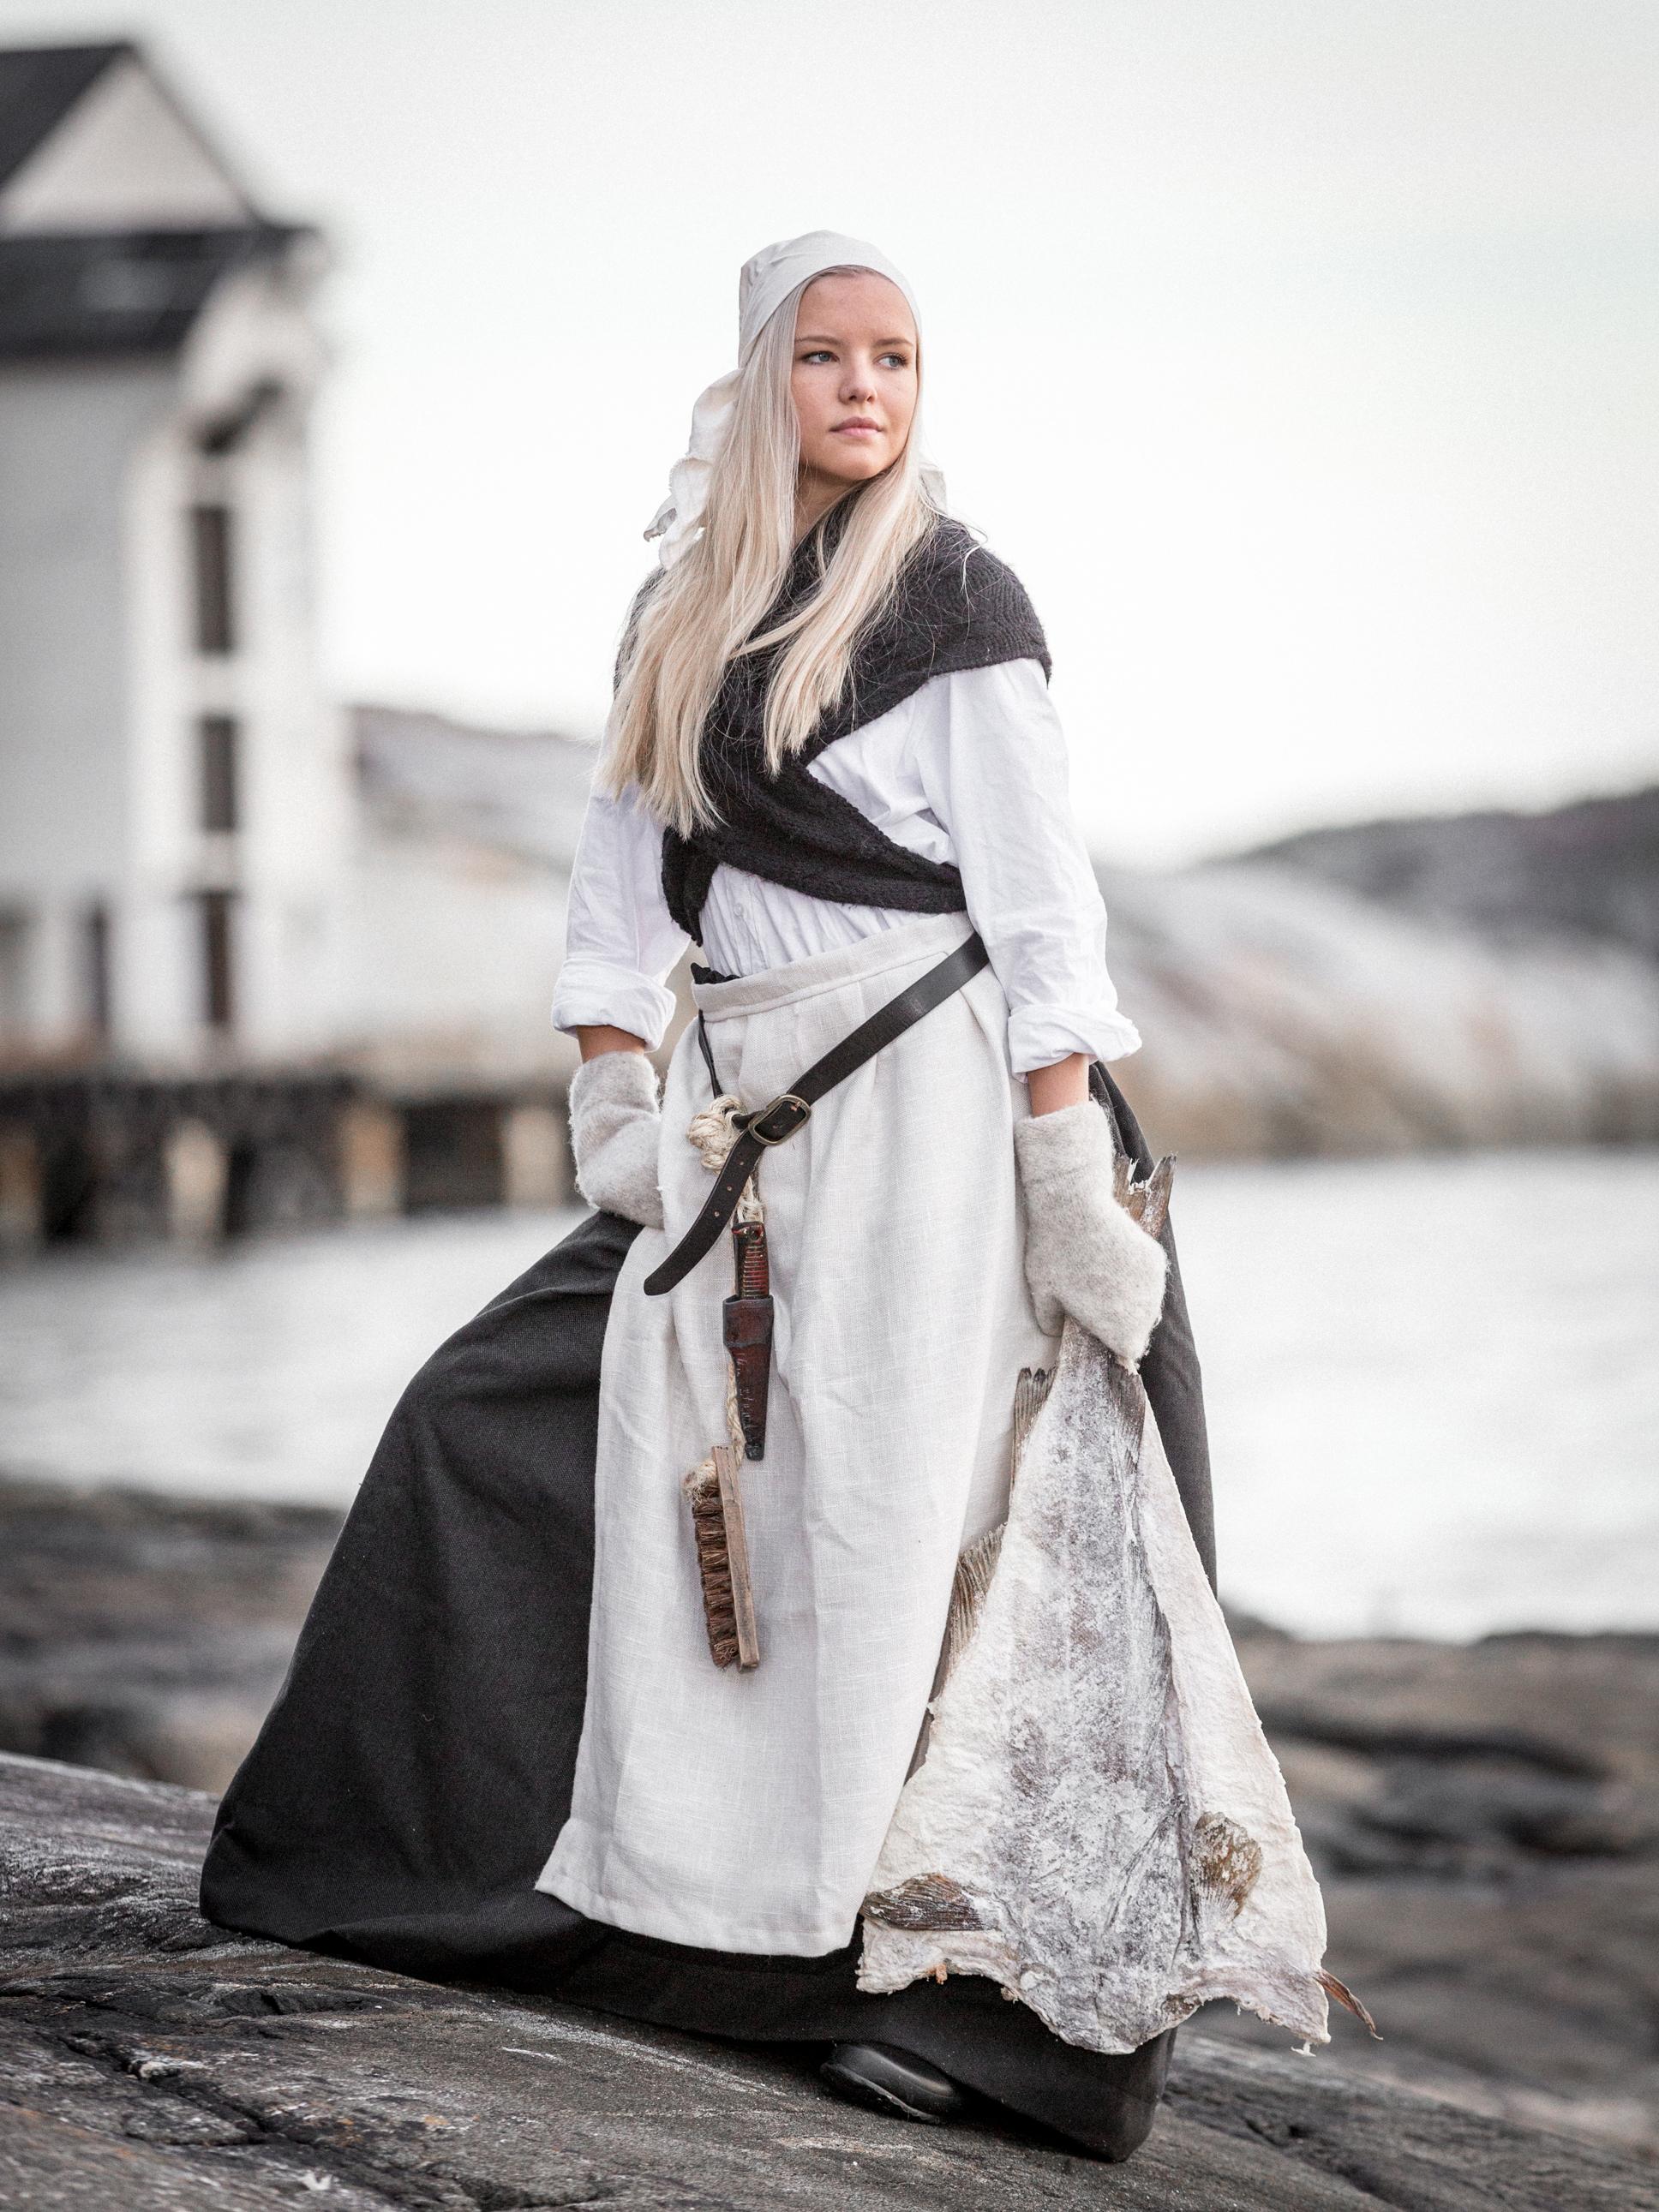 Klippfisk-kjærringa - The Bacalhau da Noruega Exhibition at Nordic Light International Festival of Photography.